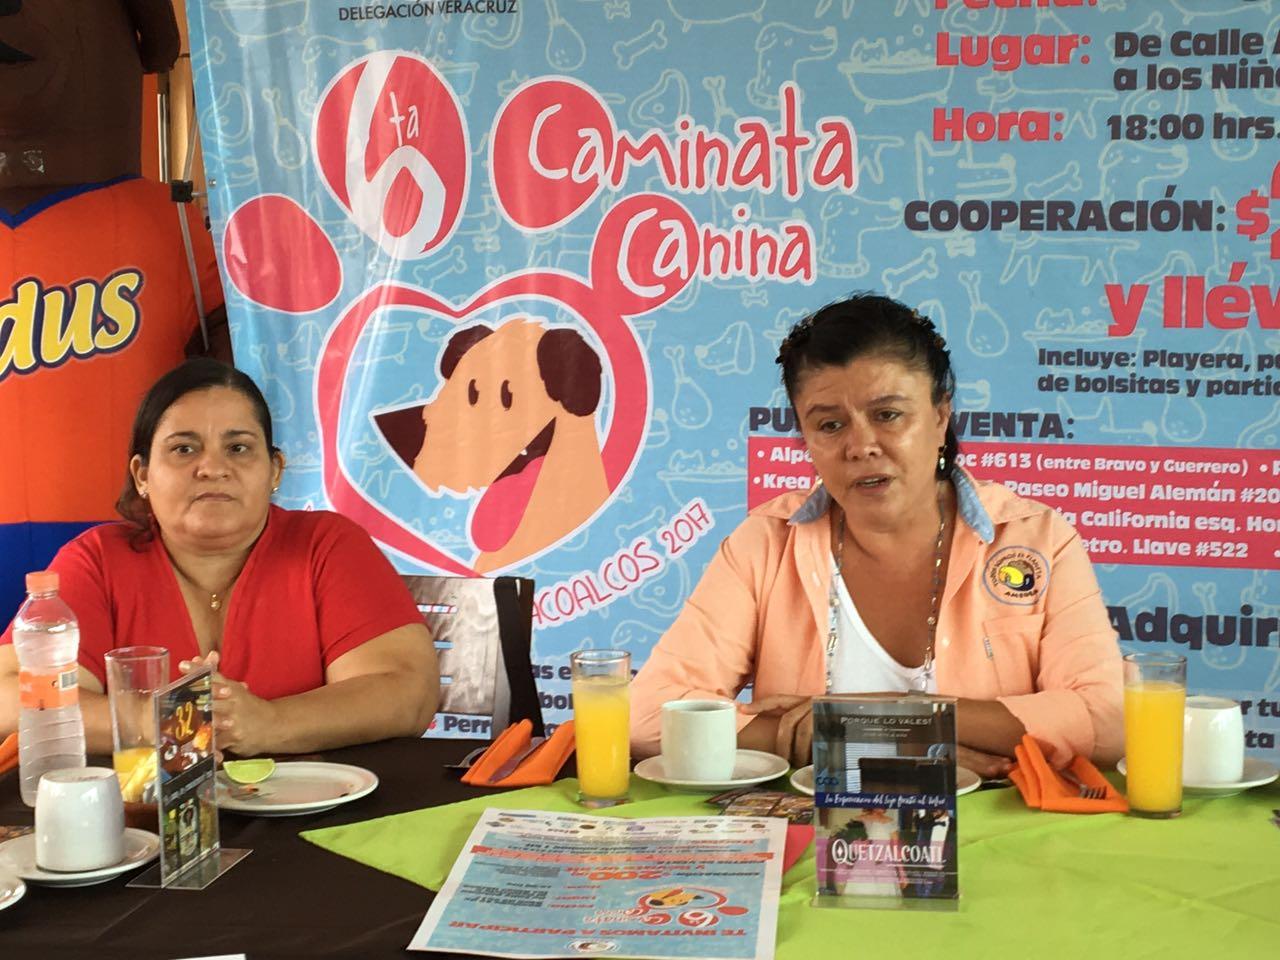 Invitan a Sexta caminata canina en Coatzacoalcos